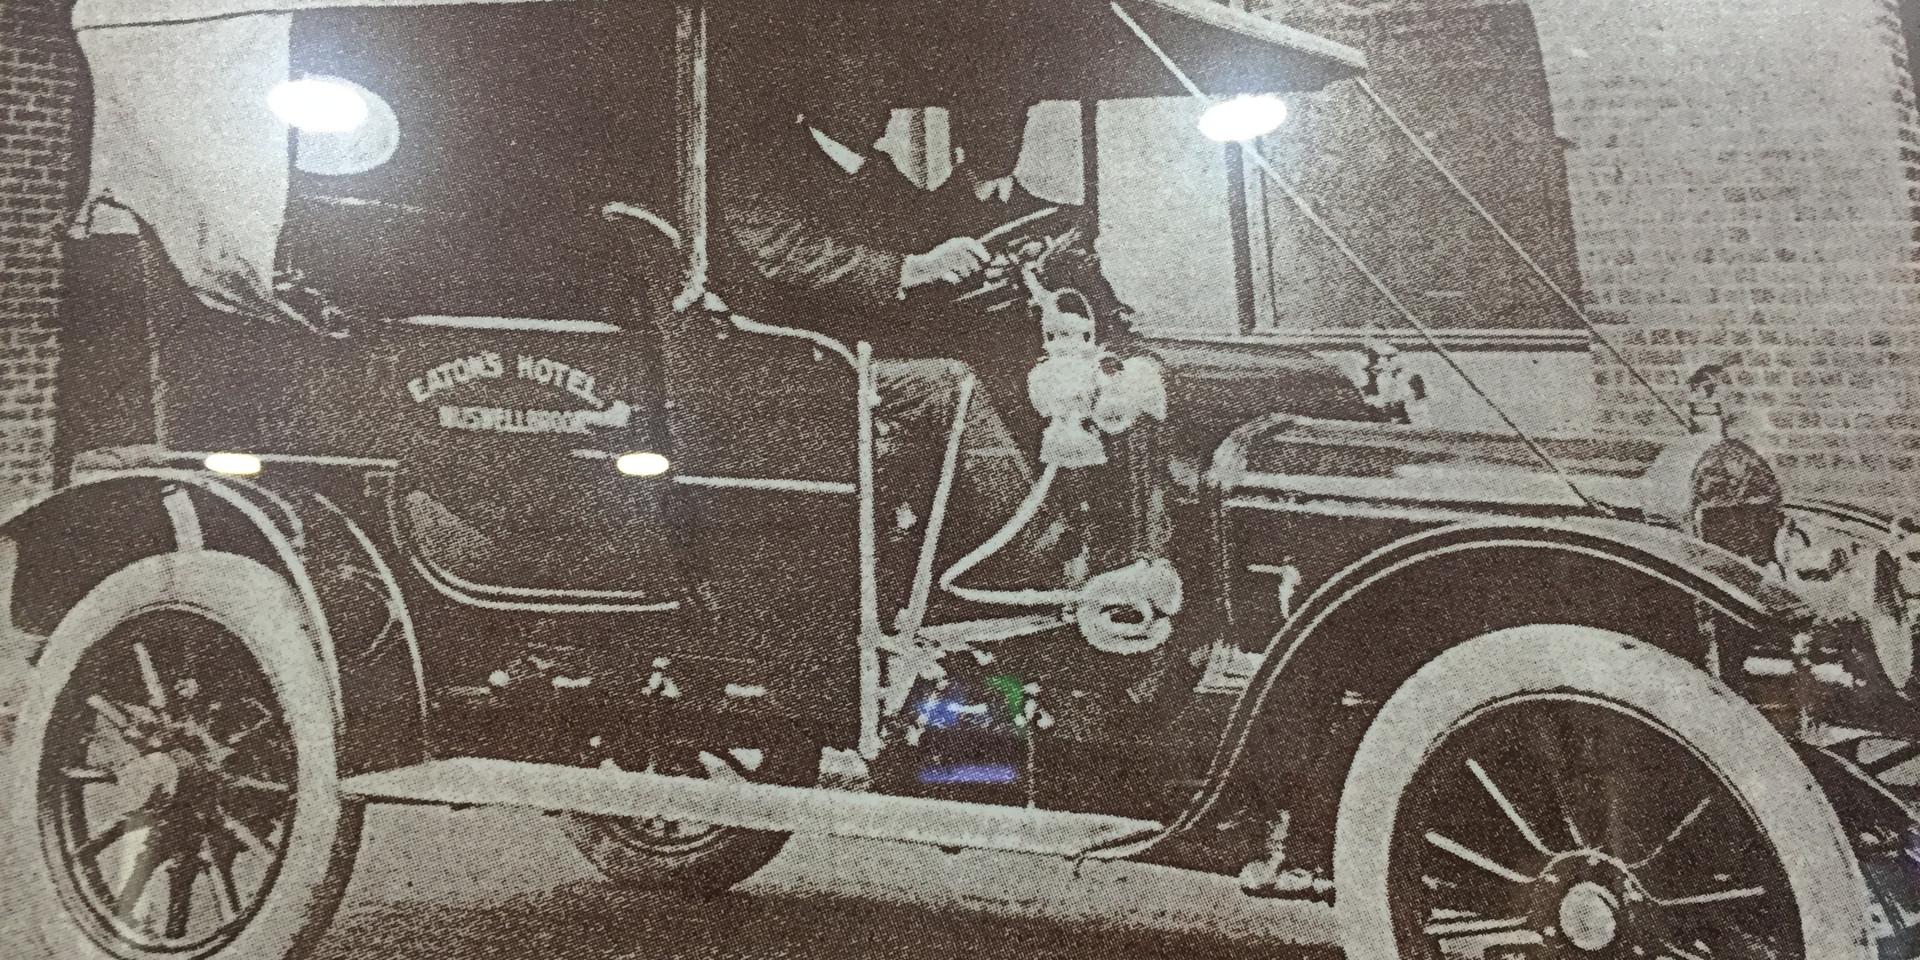 Eatons Hotel Heritage Motor Car Photo